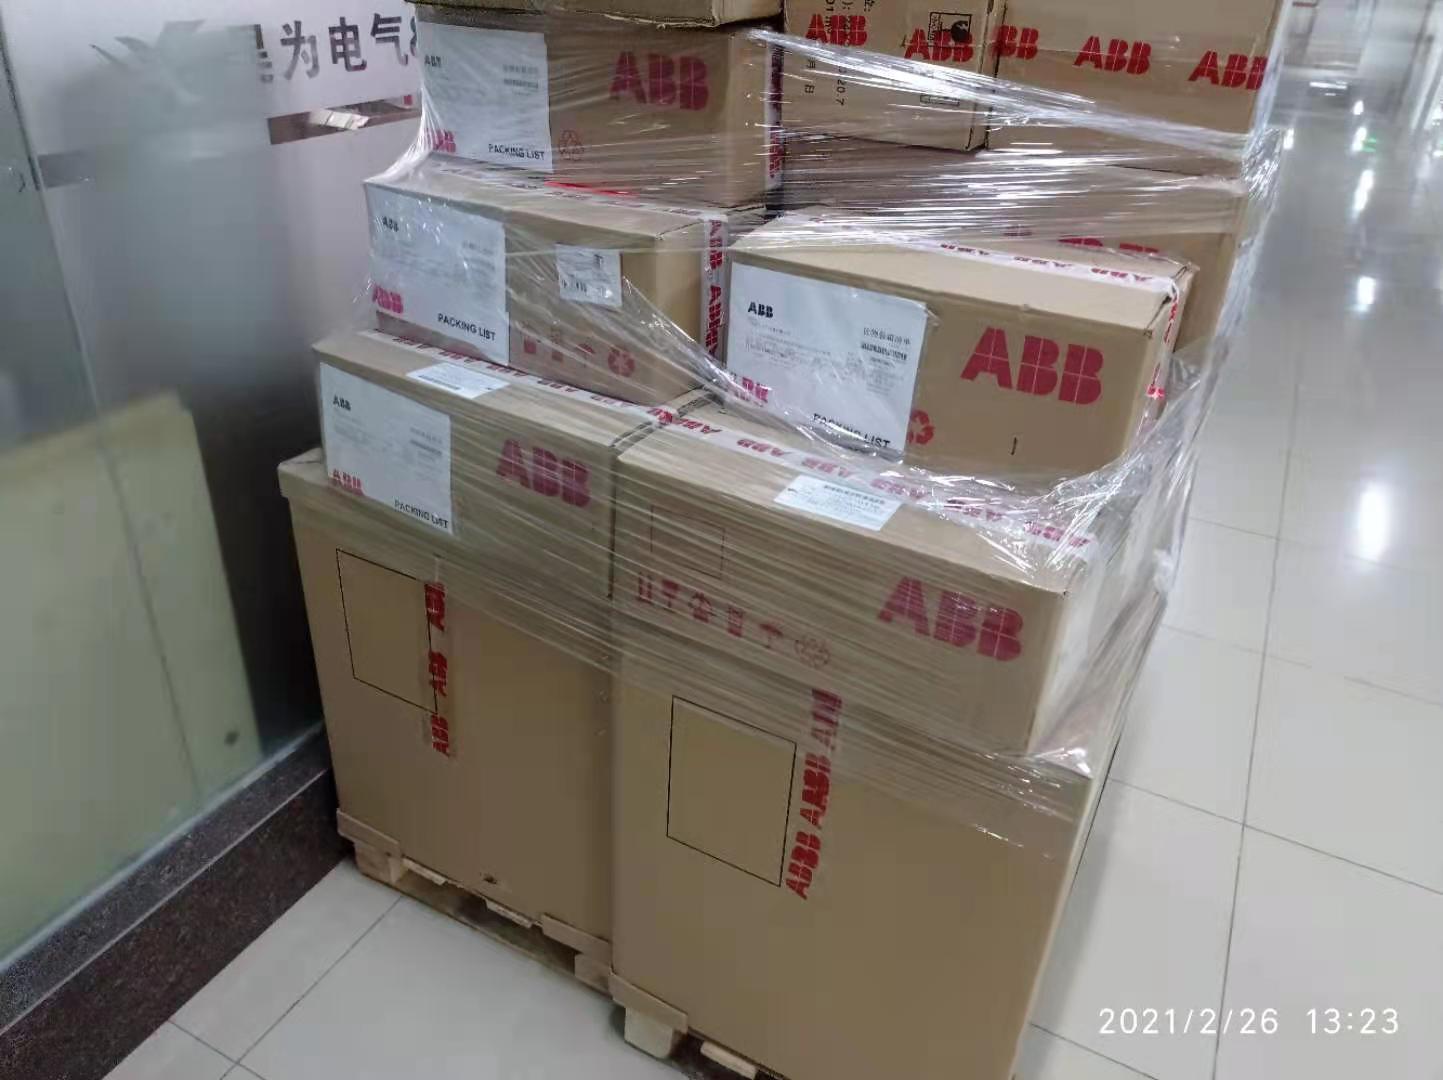 abb电子脱扣器 pr221ds-ls i t6s 630 3p